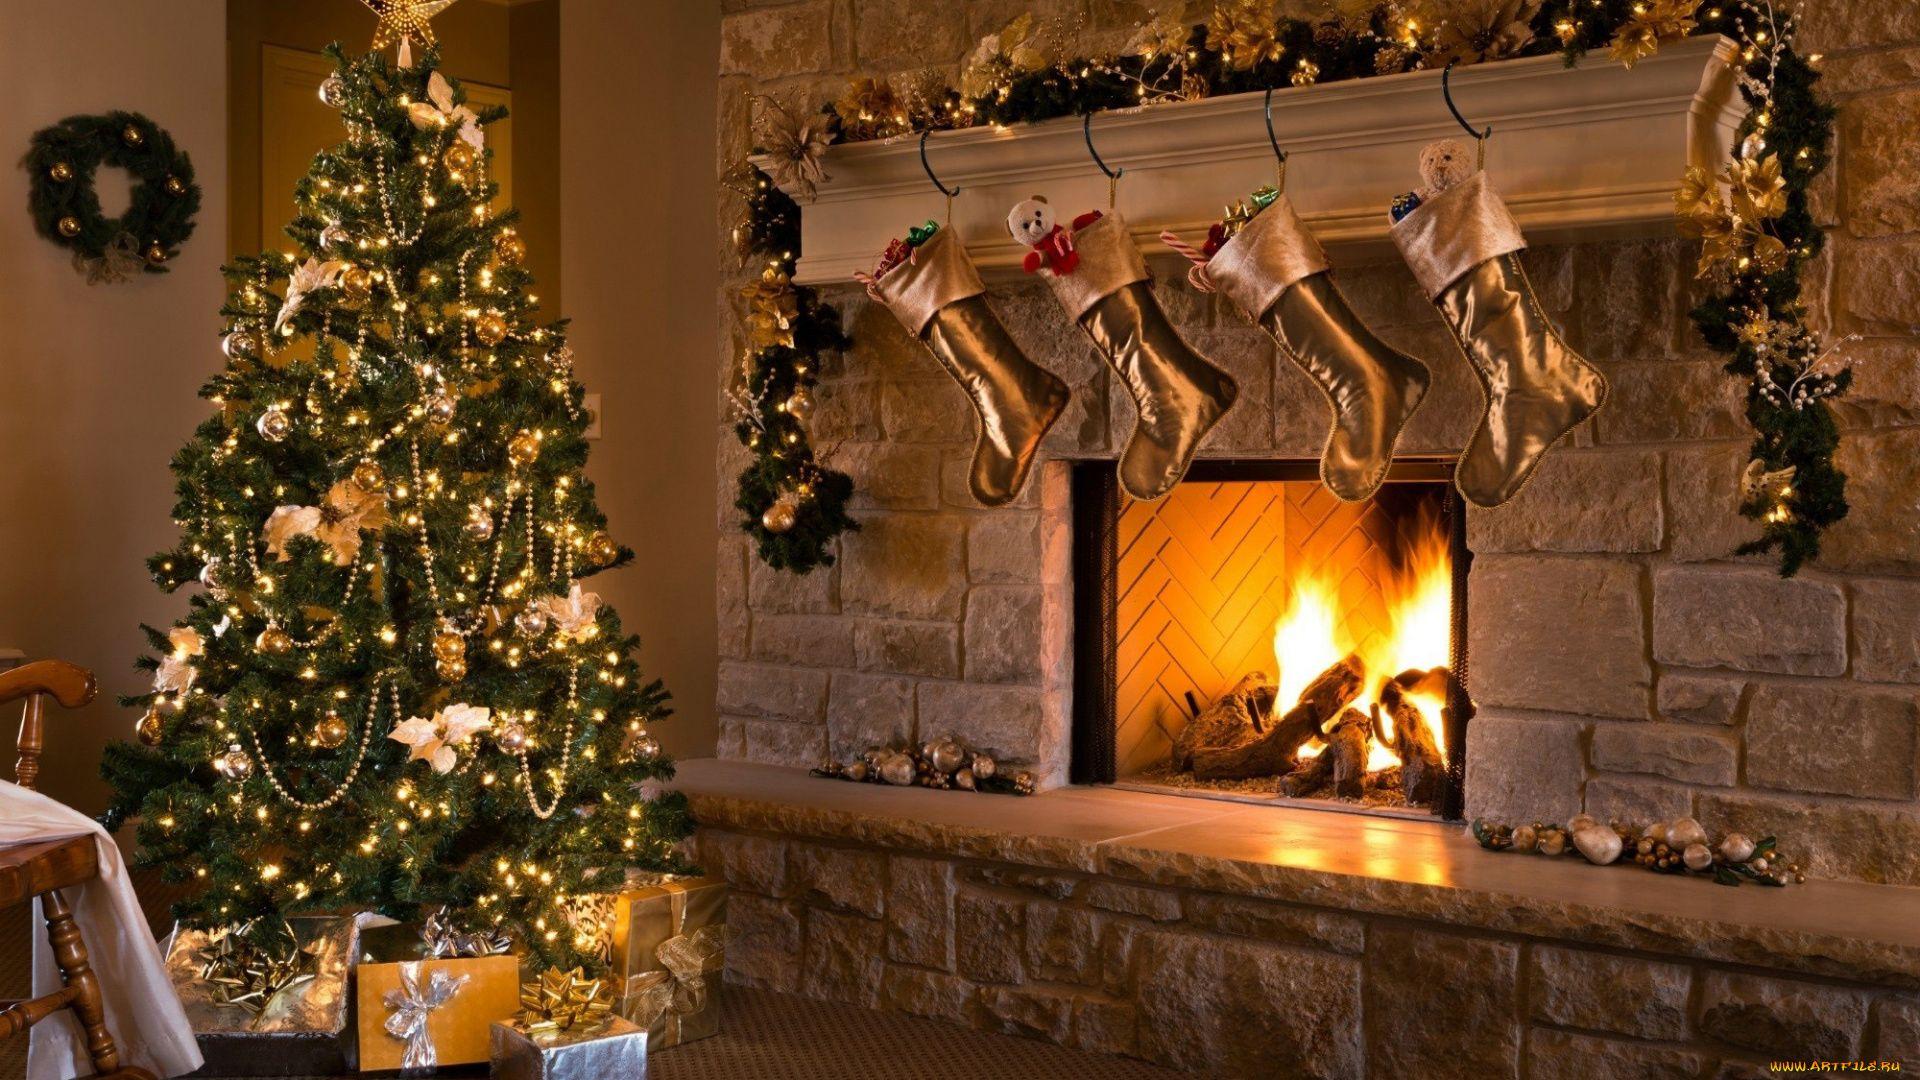 Christmas Fireplace Comfort PC Wallpaper